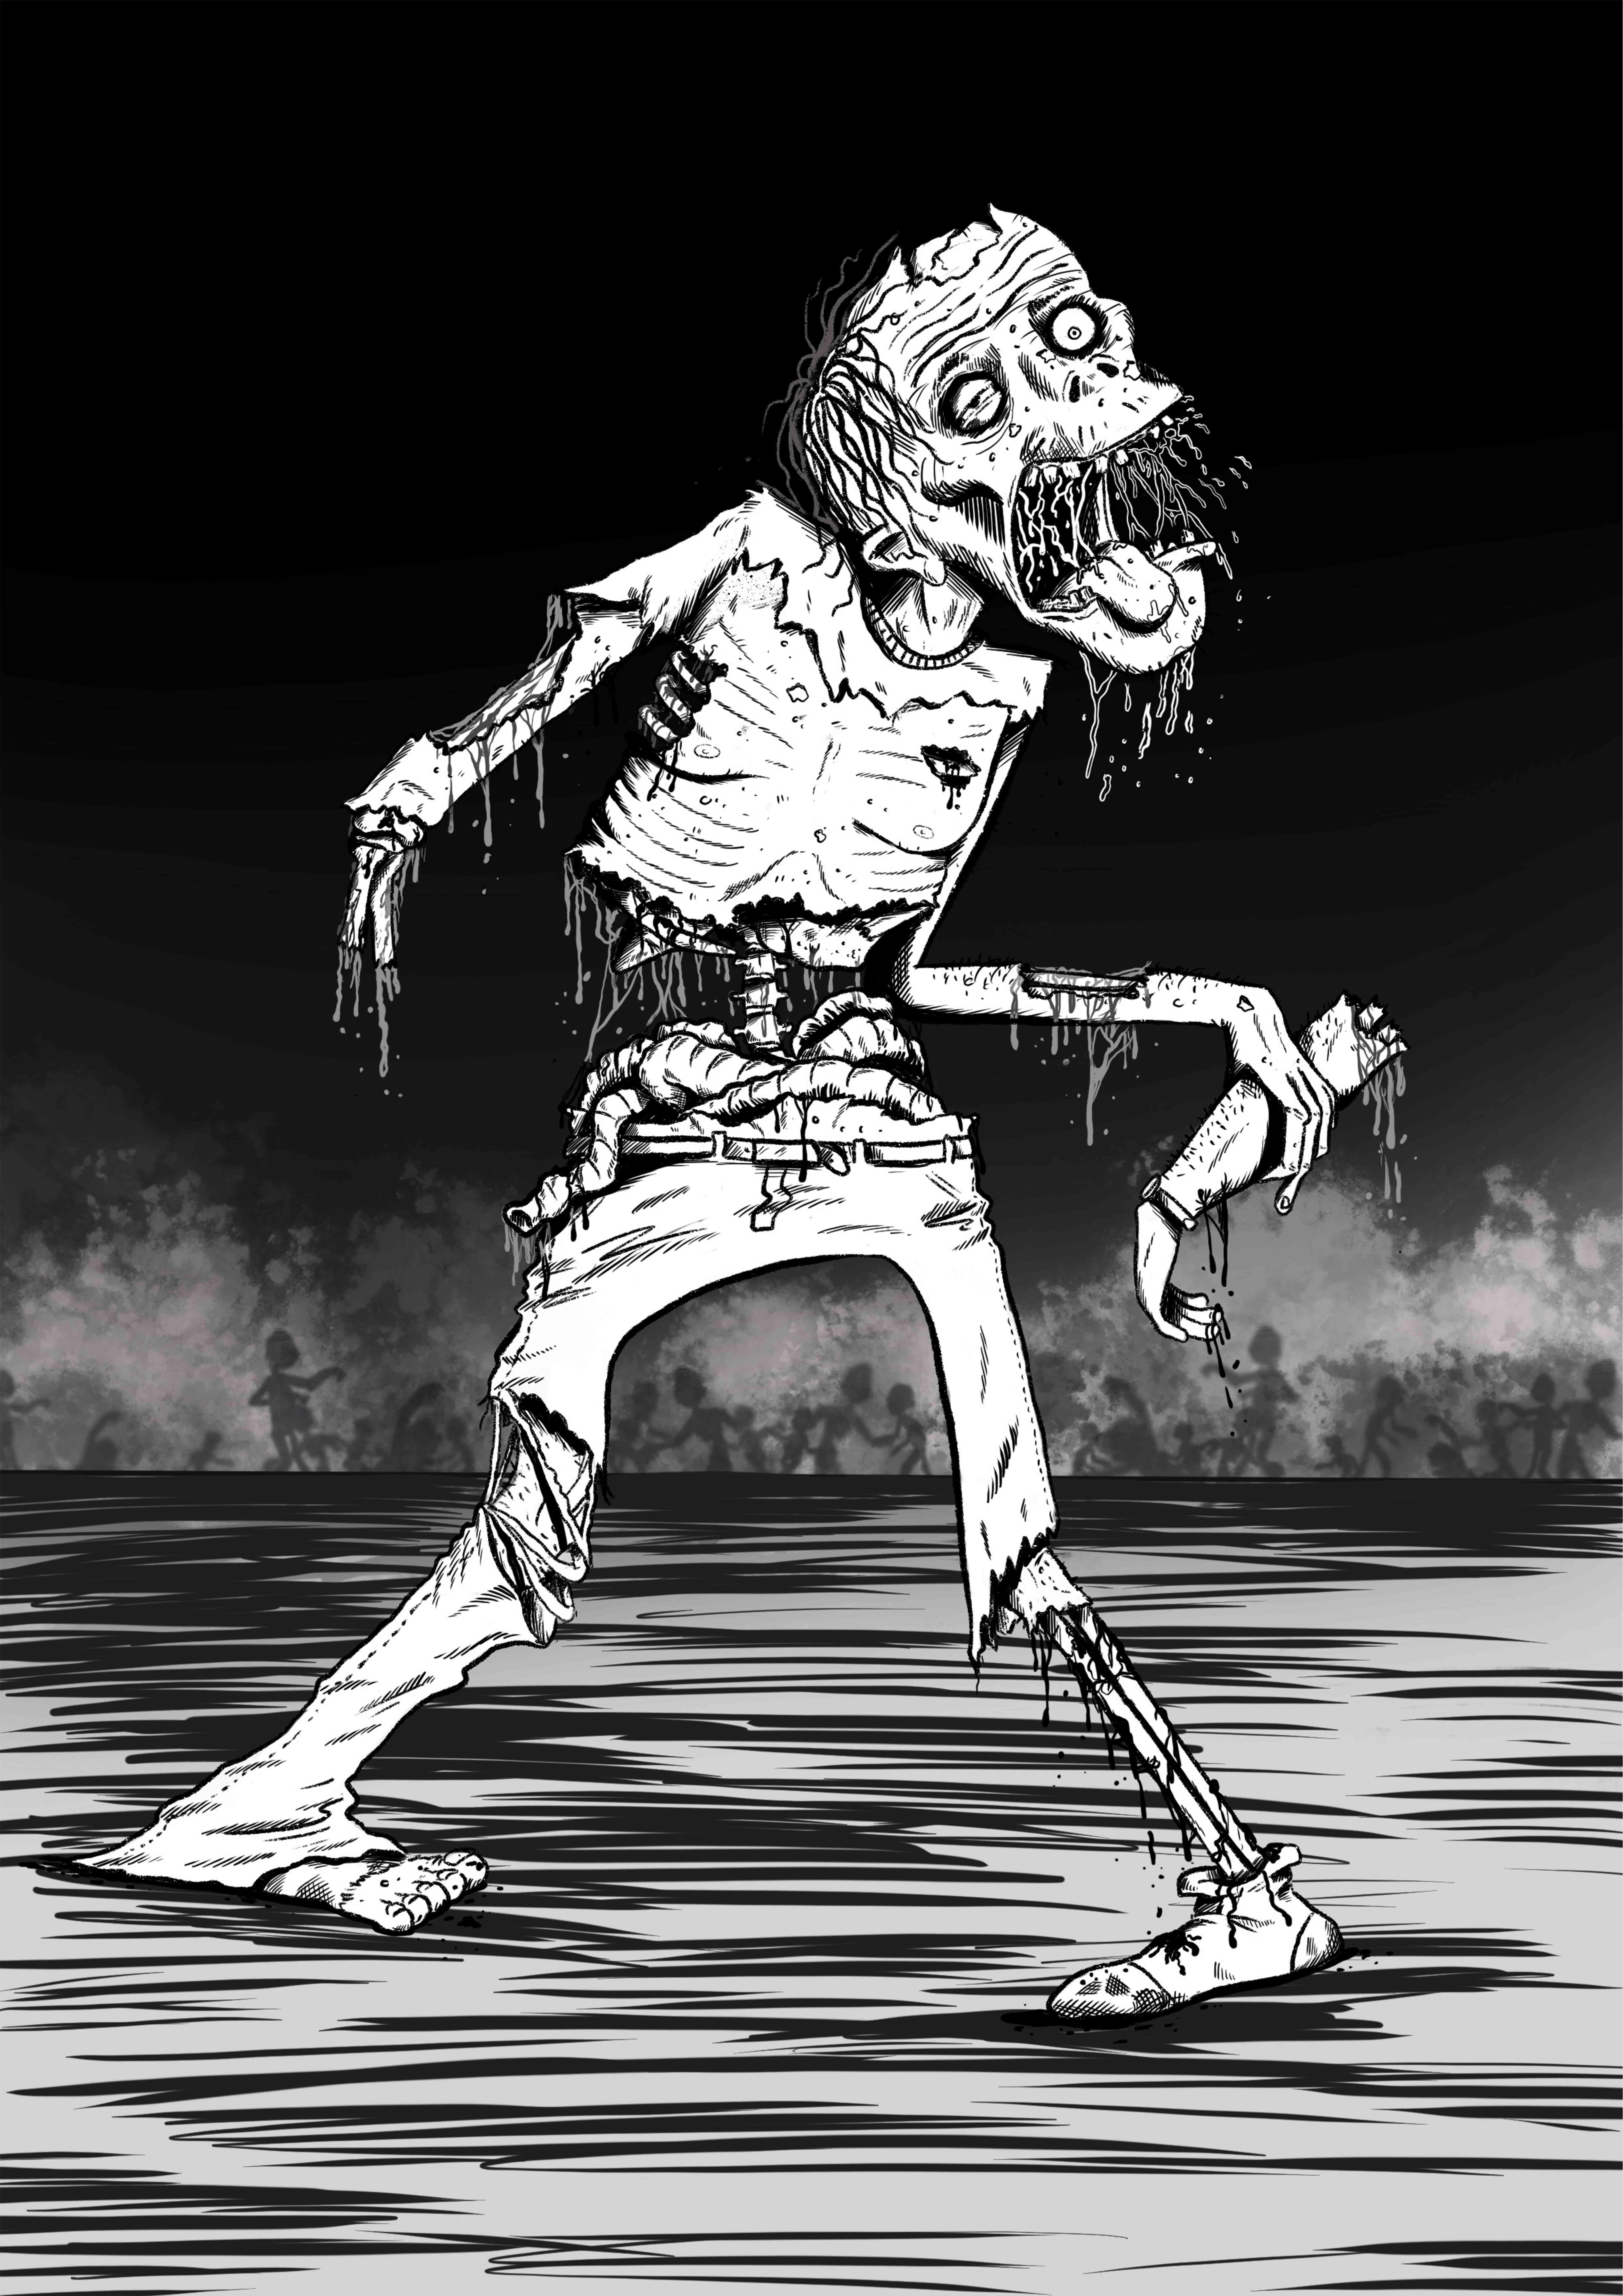 Comic book style zombie